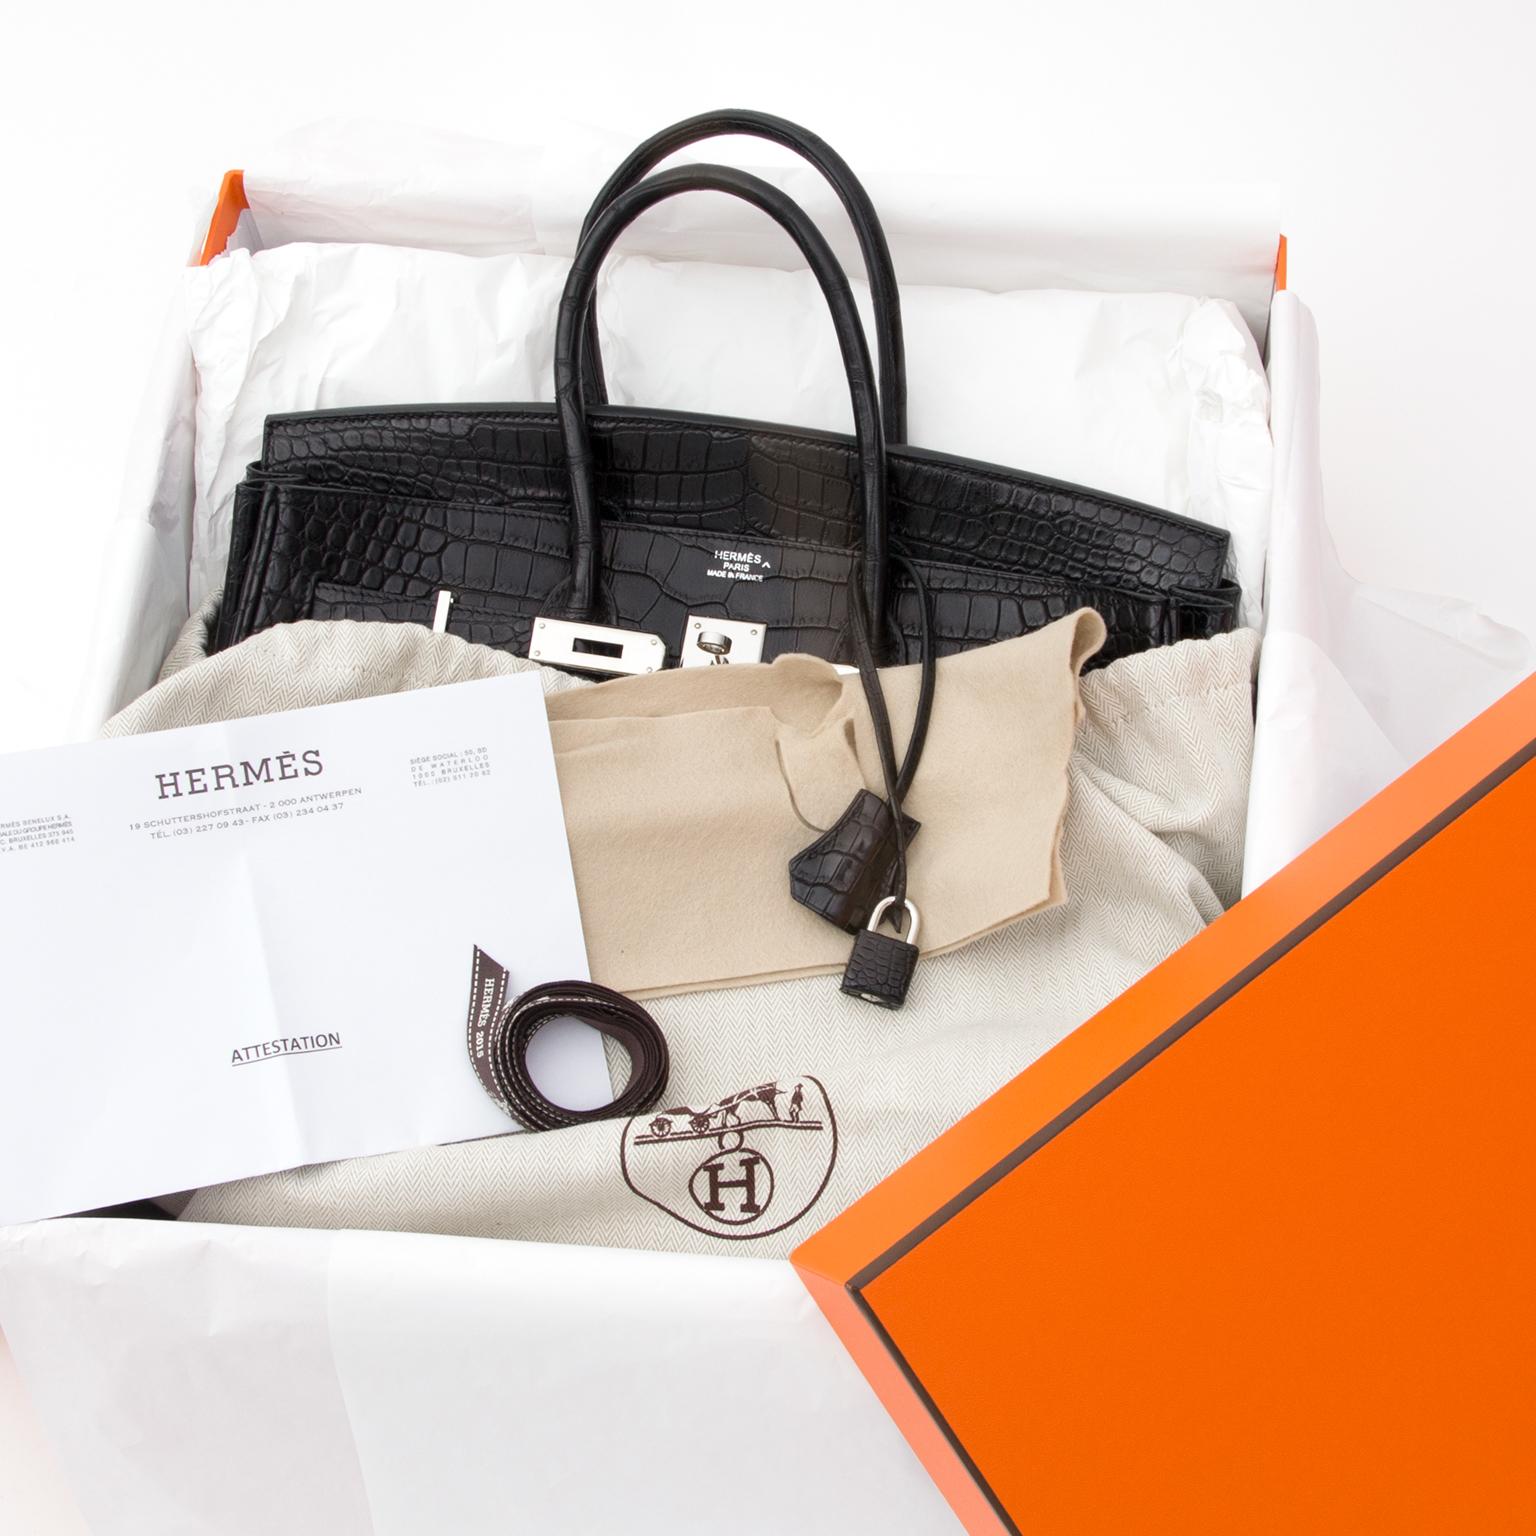 hermes paris purse - Top Handle - Bags Your go-to shopping place for vintage \u0026amp; pre ...